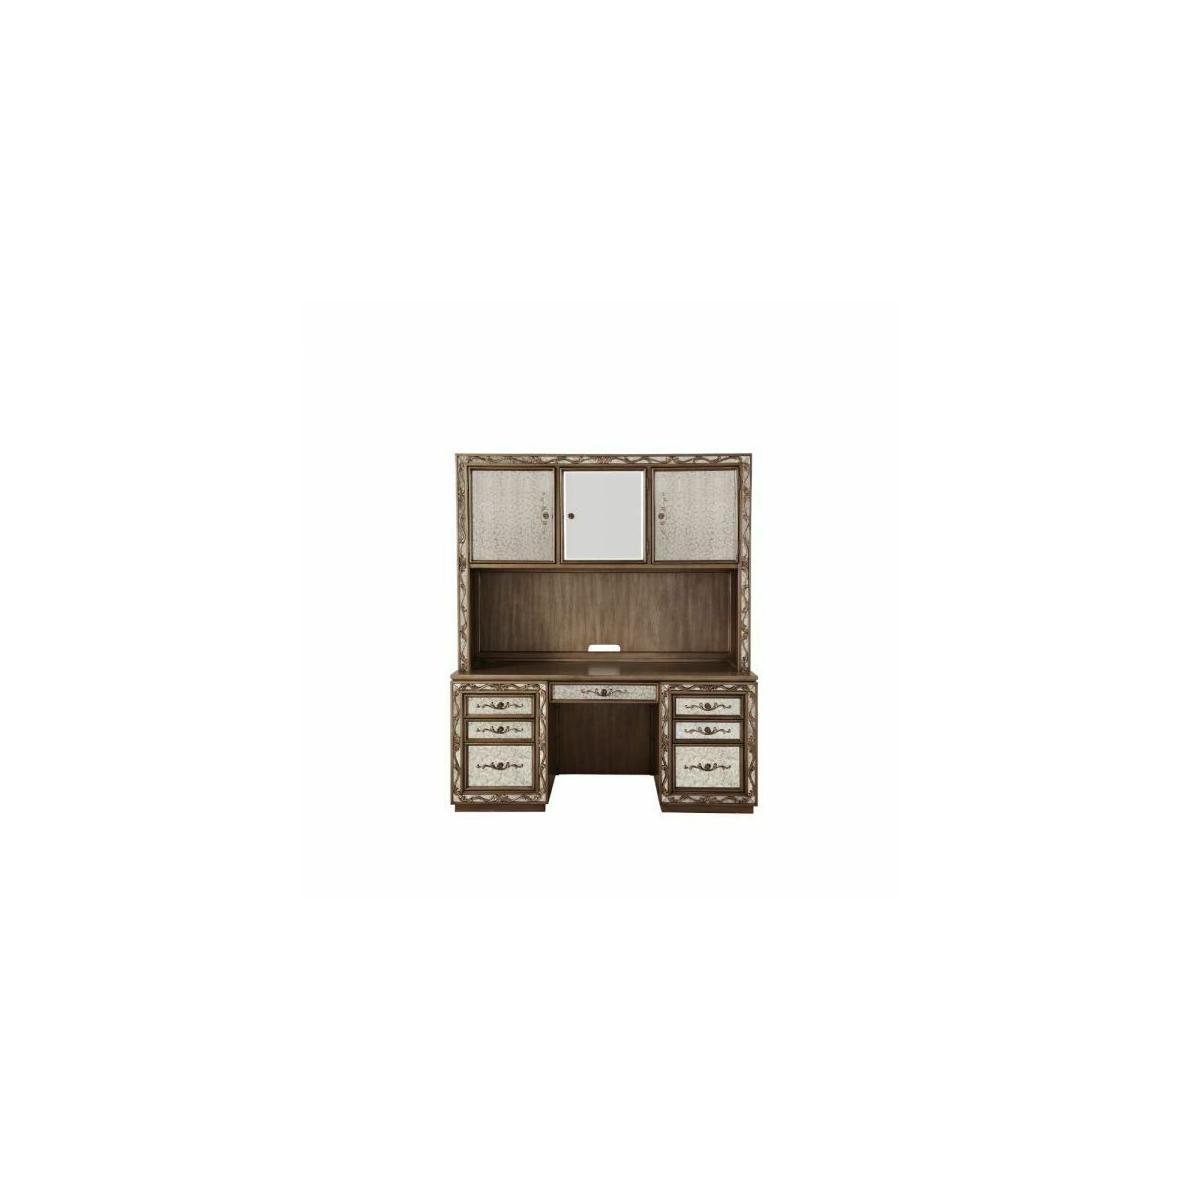 ACME Orianne Computer Desk & Hutch - 93790 - Antique Gold